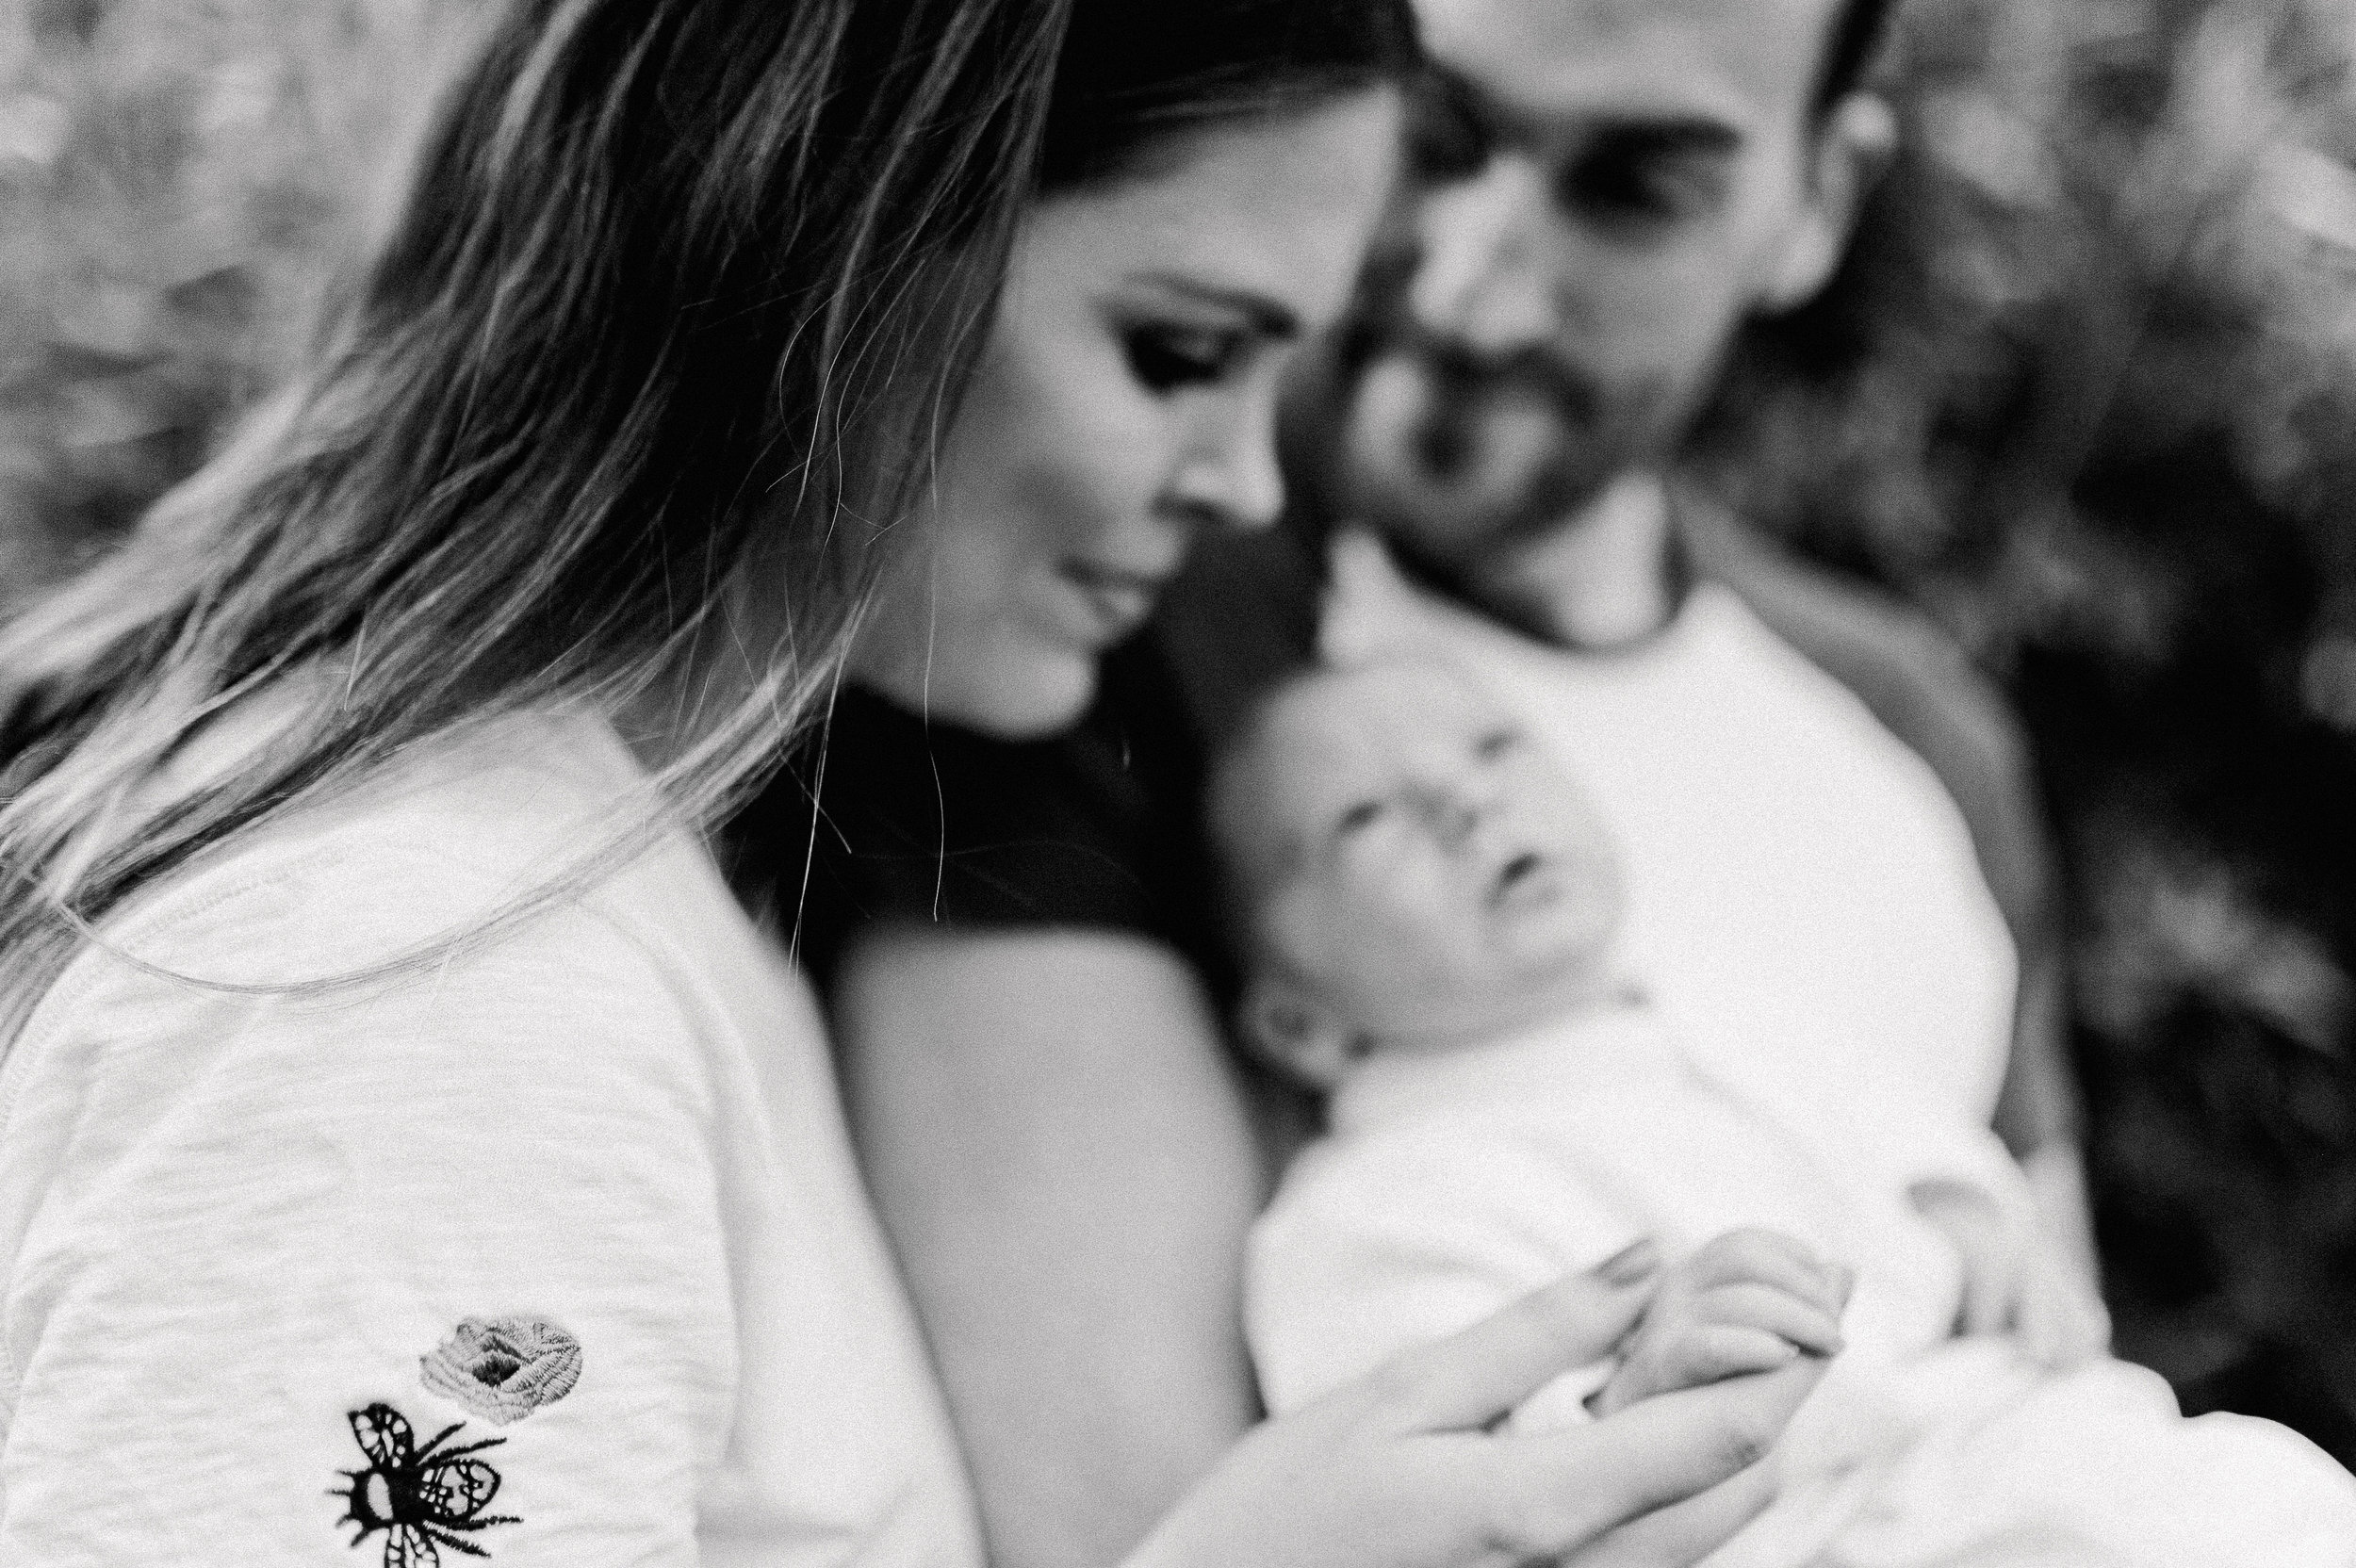 Anna-Hari-Photography-Familienshooting-Neugeborenenshooting-Mannheim-Heidelberg32.jpg